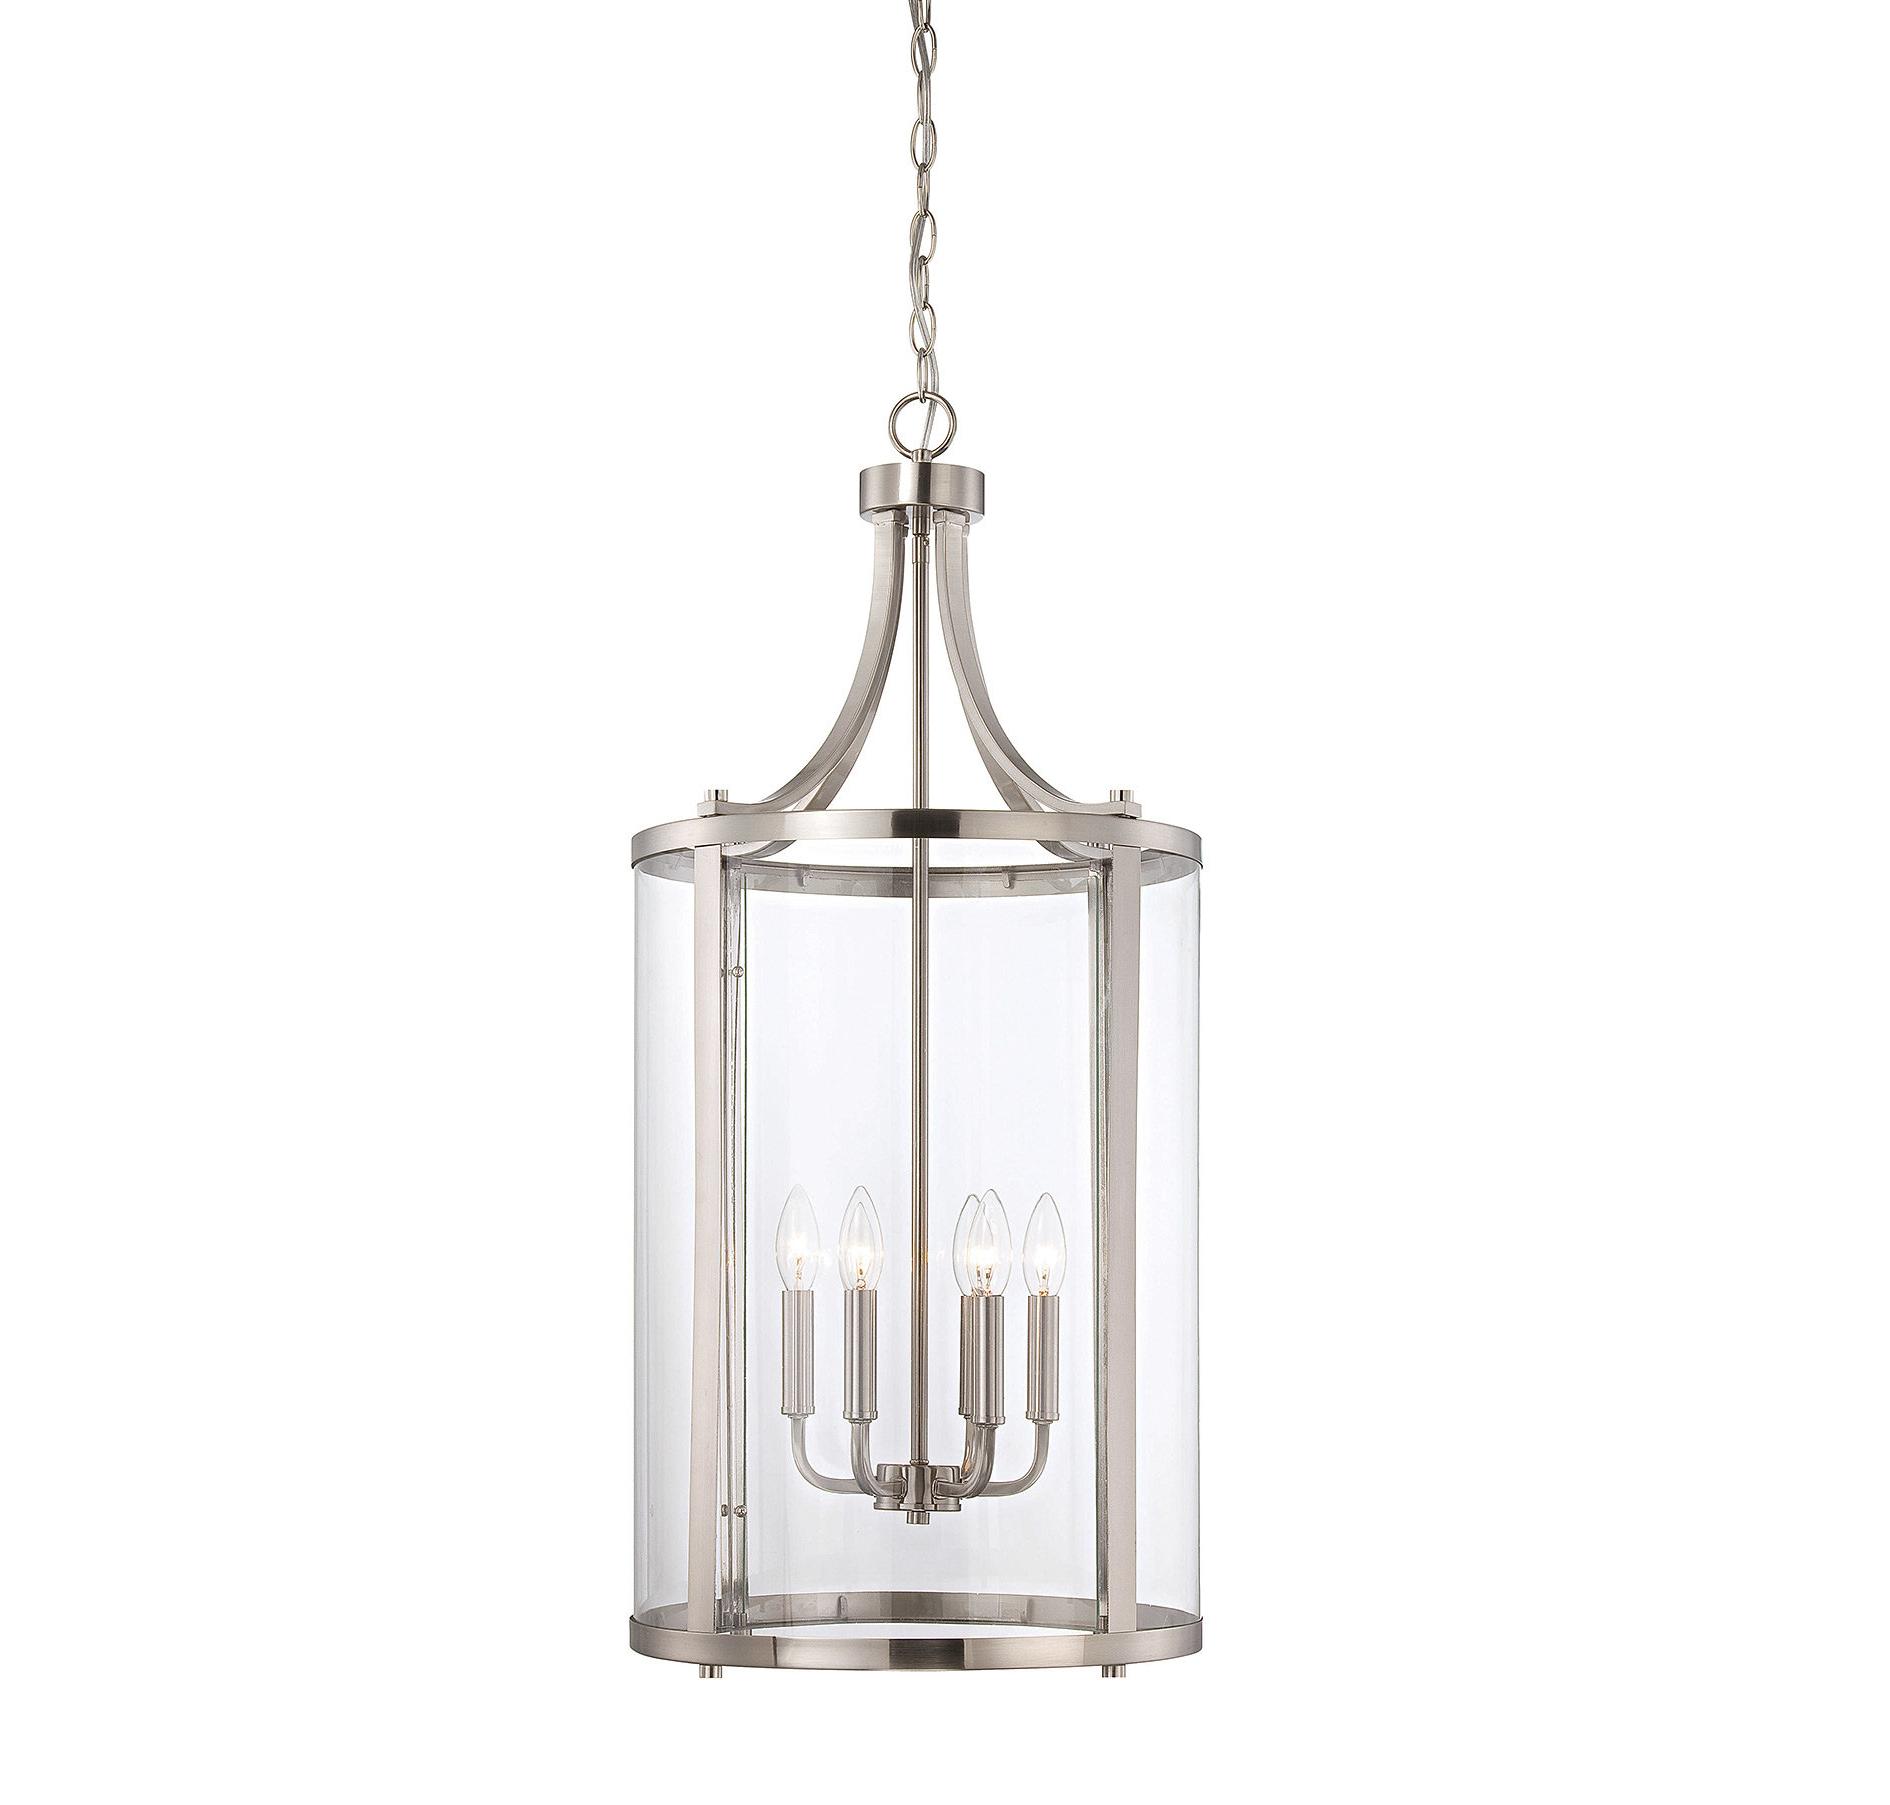 Preferred Armande 4 Light Lantern Drum Pendants For Brookville 6 Light Lantern Cylinder Pendant (View 18 of 25)